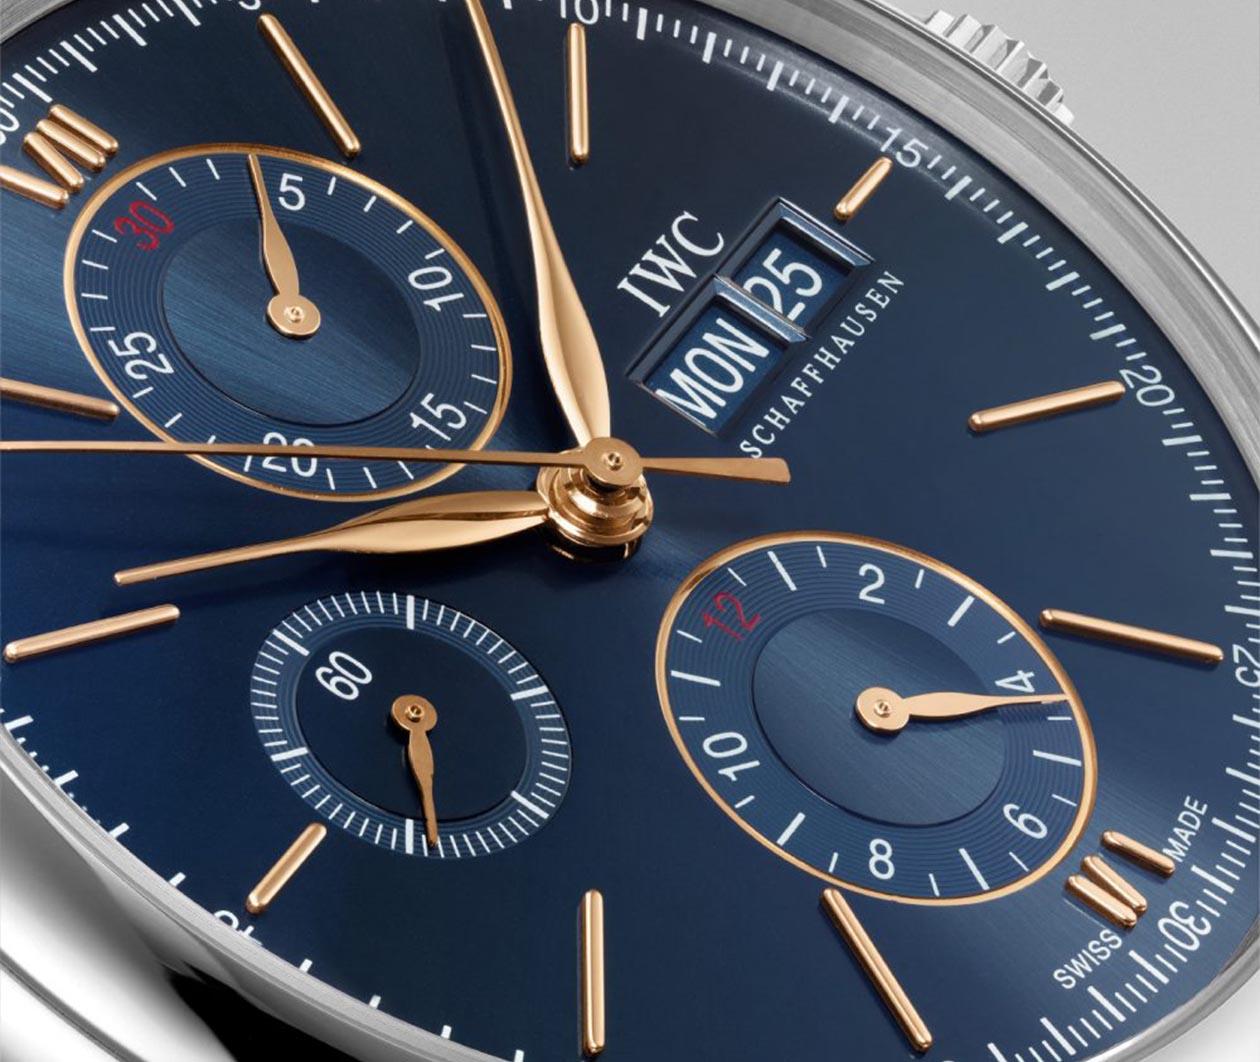 IWC Portofino Chronograph IW391036 Carousel 4 FINAL